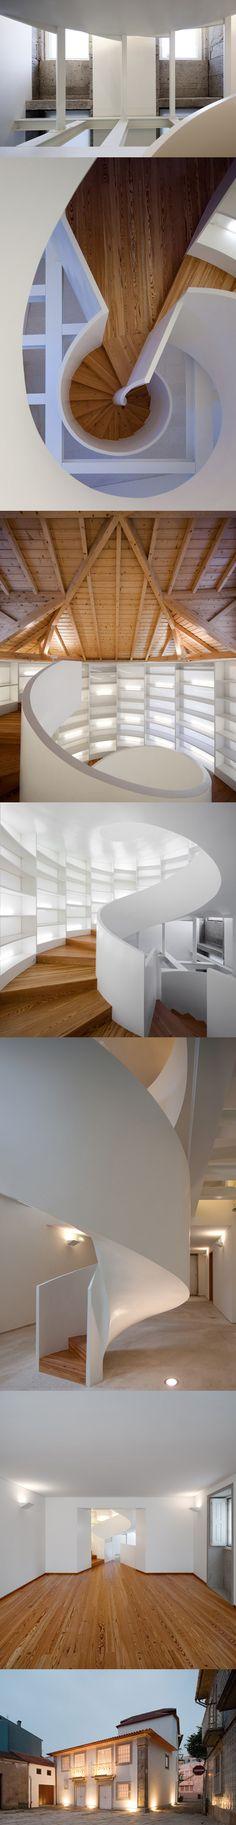 House Antero De Quantral Interior Design